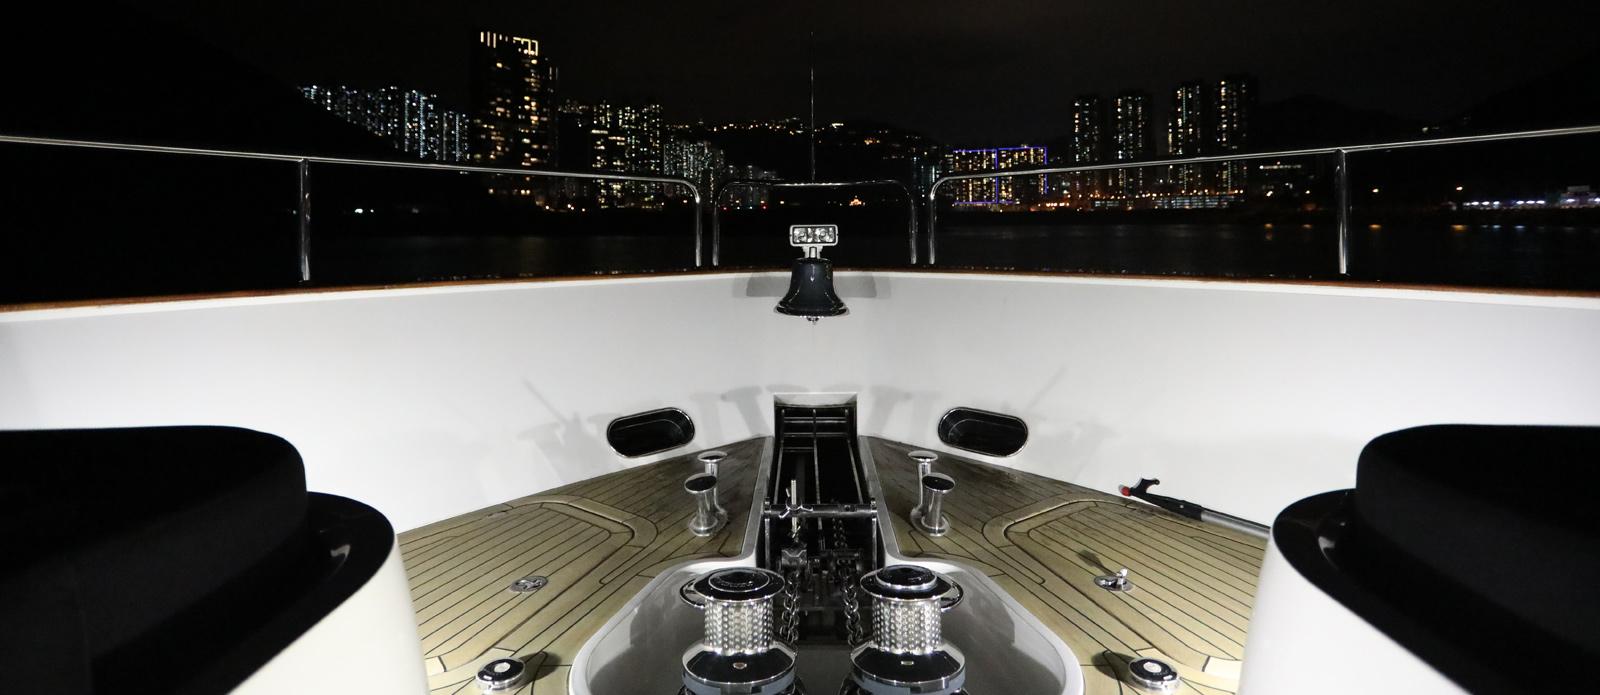 Sunseeker-28-Metre-Yacht-Diablo-Capstan-Arrangement